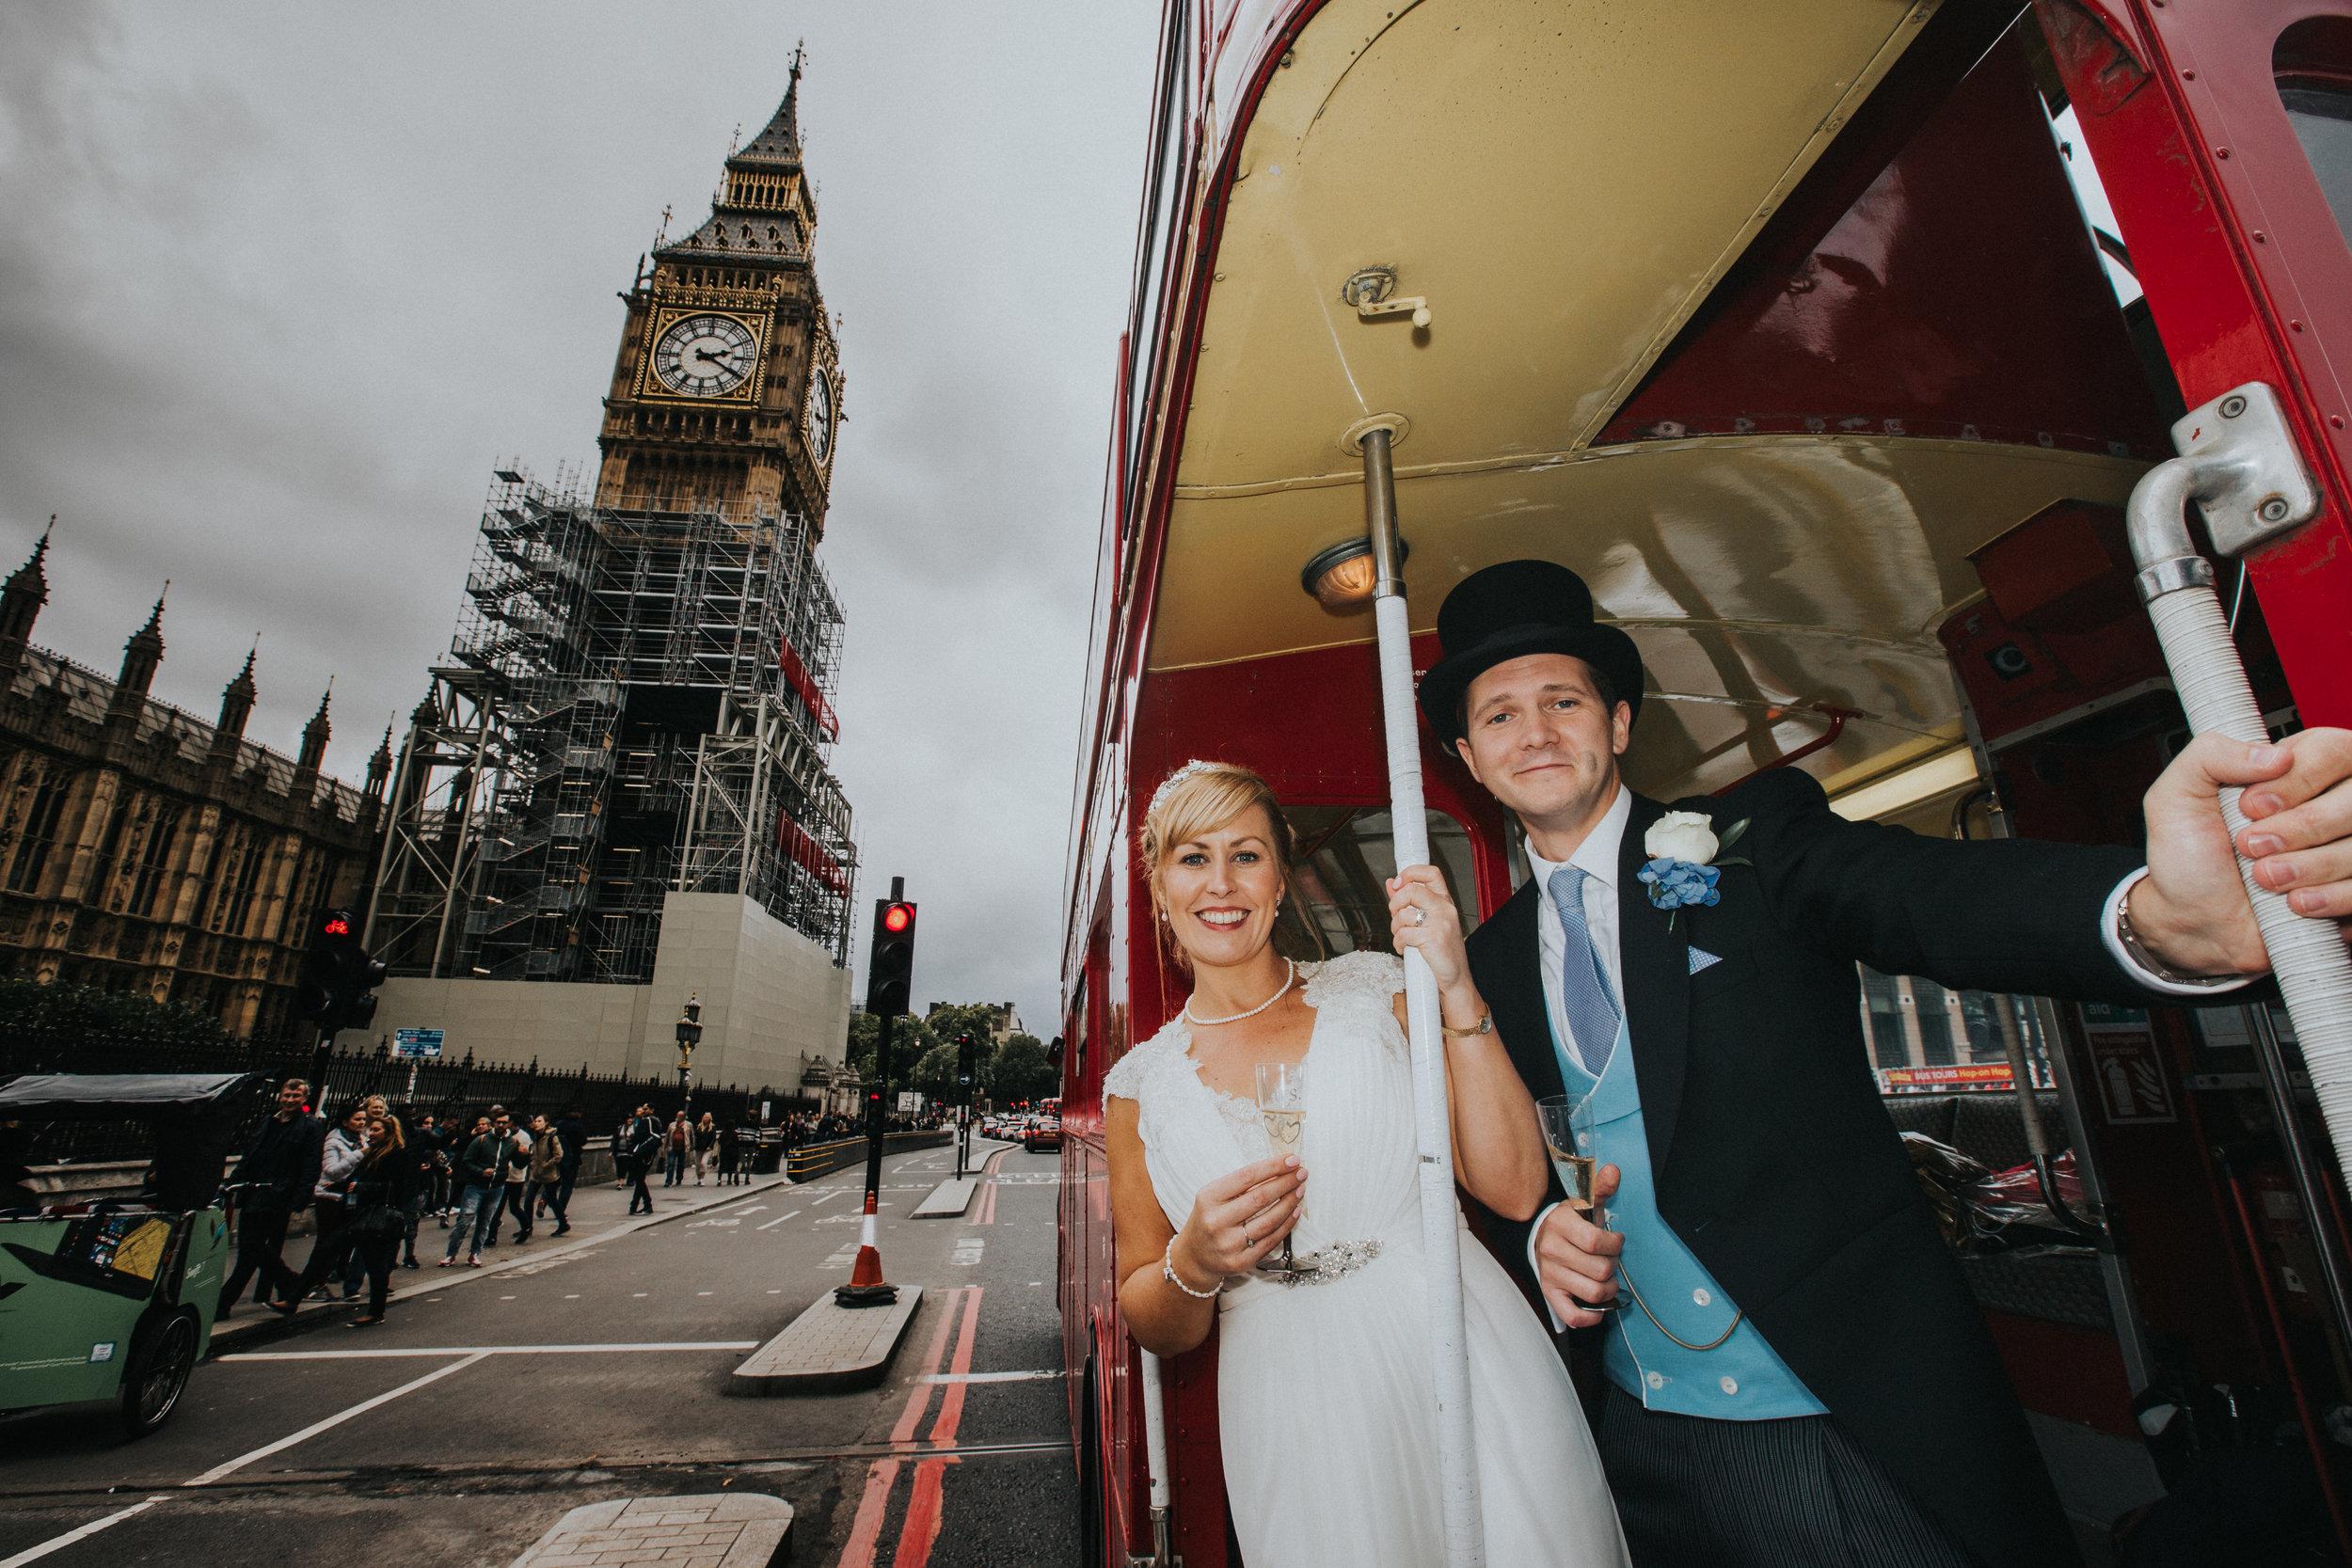 london-wedding-photography-wimbledon-wandsworth-town-hall-savoy-hotel-routemaster-64